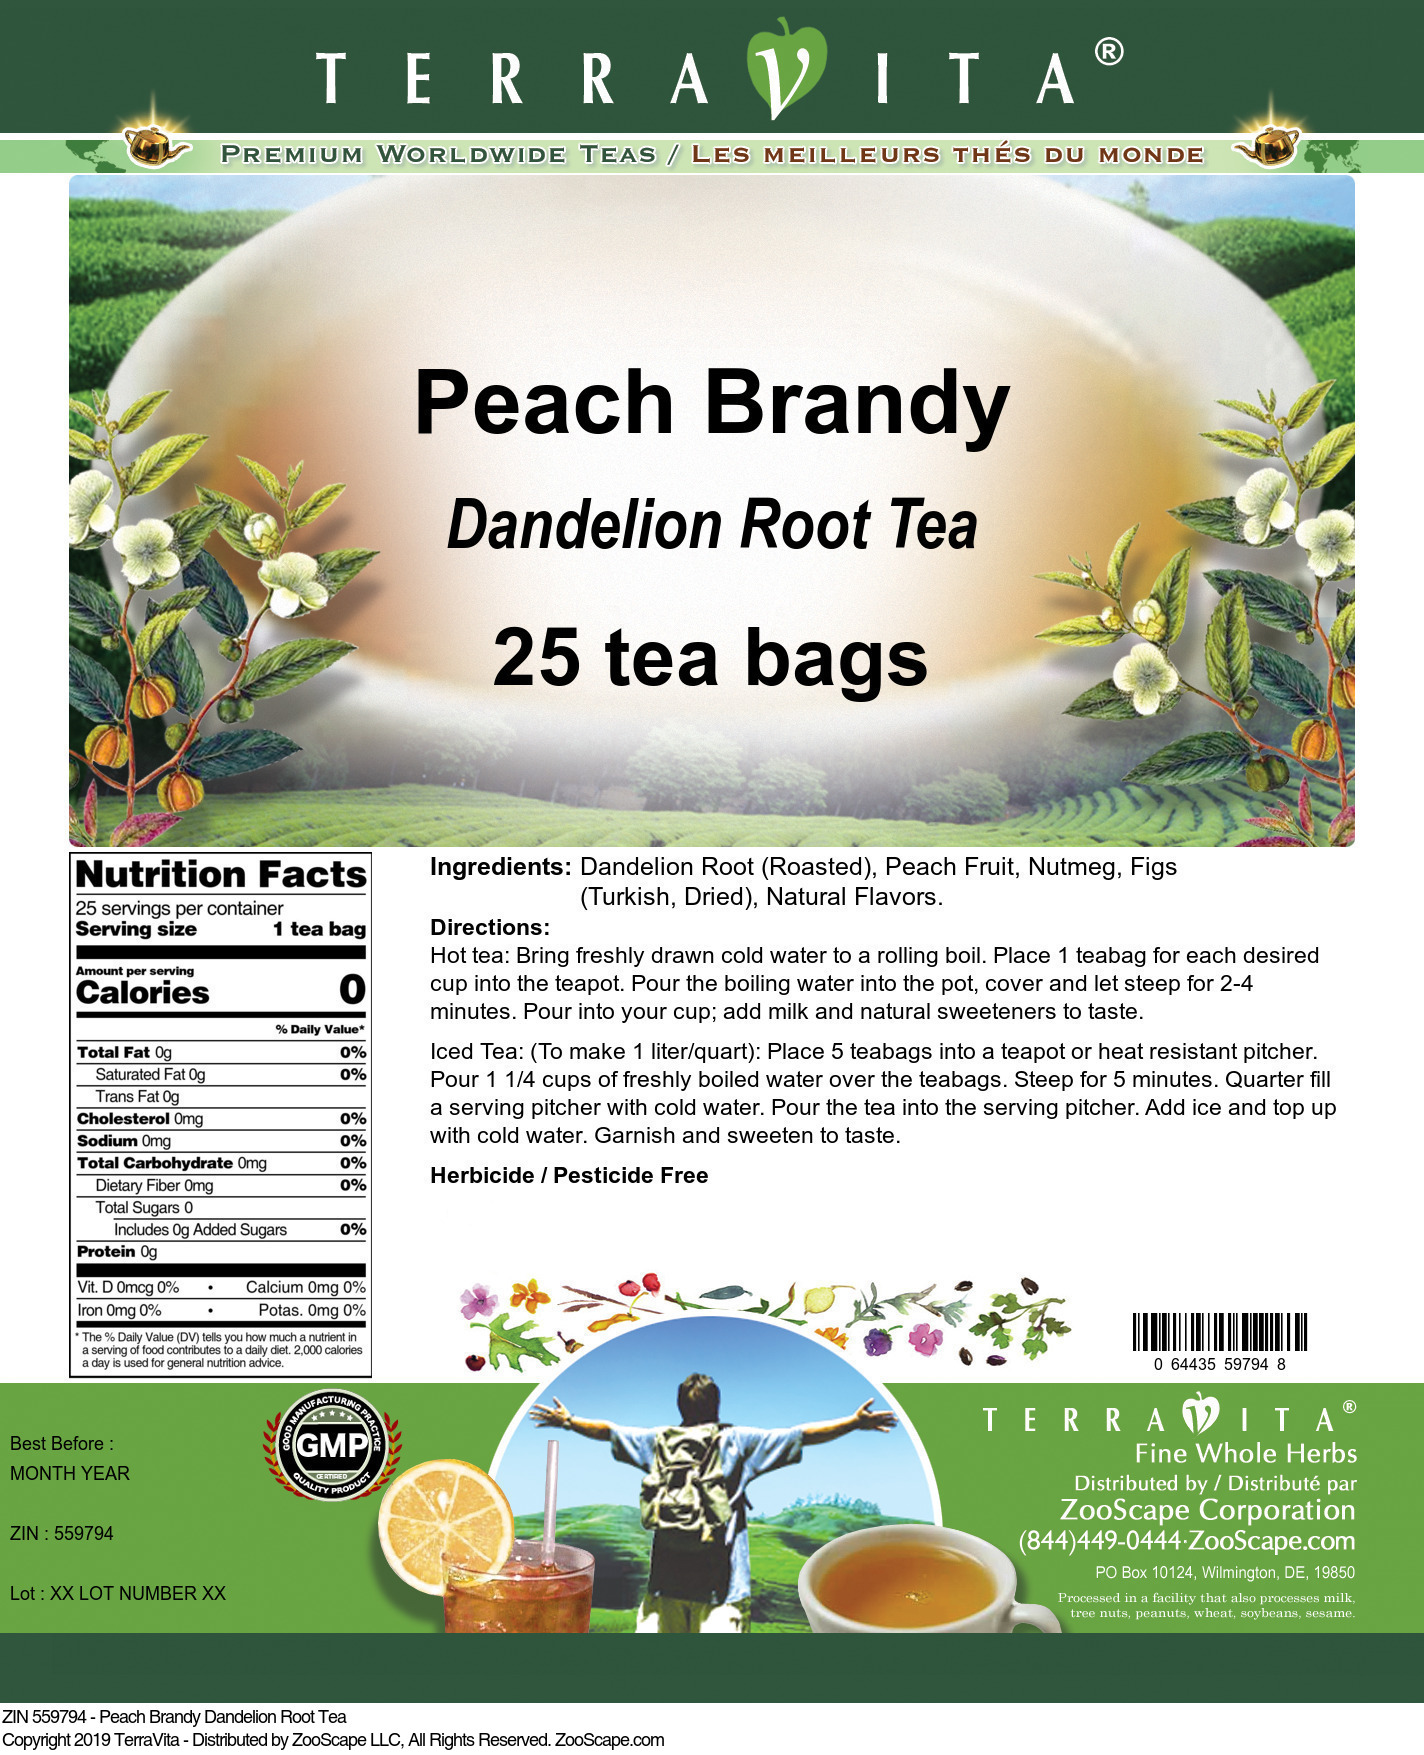 Peach Brandy Dandelion Root Tea